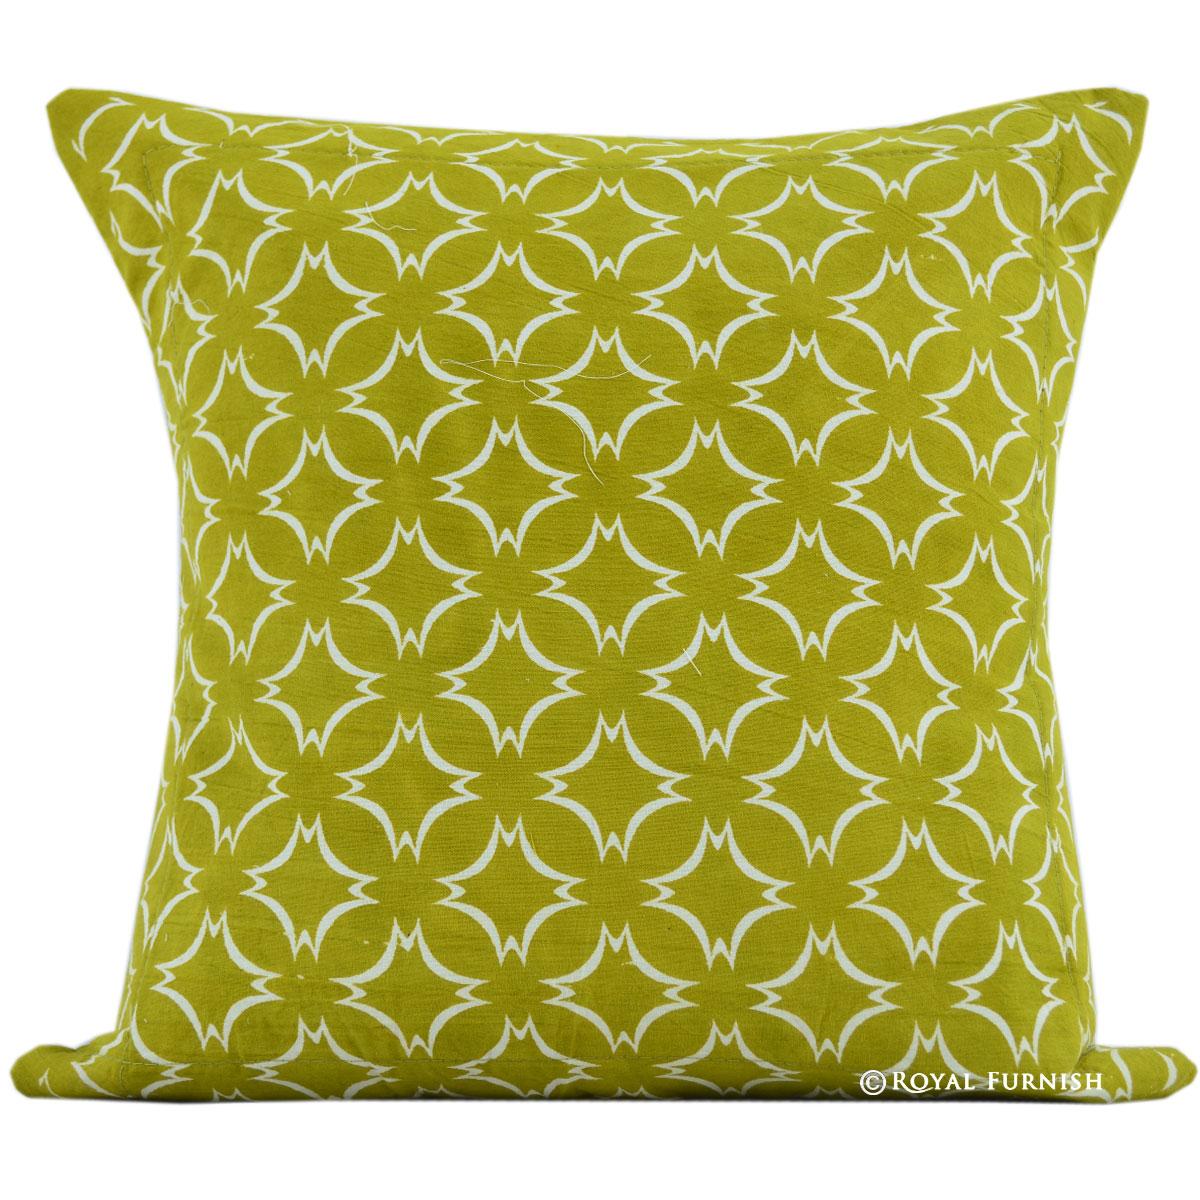 16 Quot Green Spark Design Indian Hand Block Print Cotton